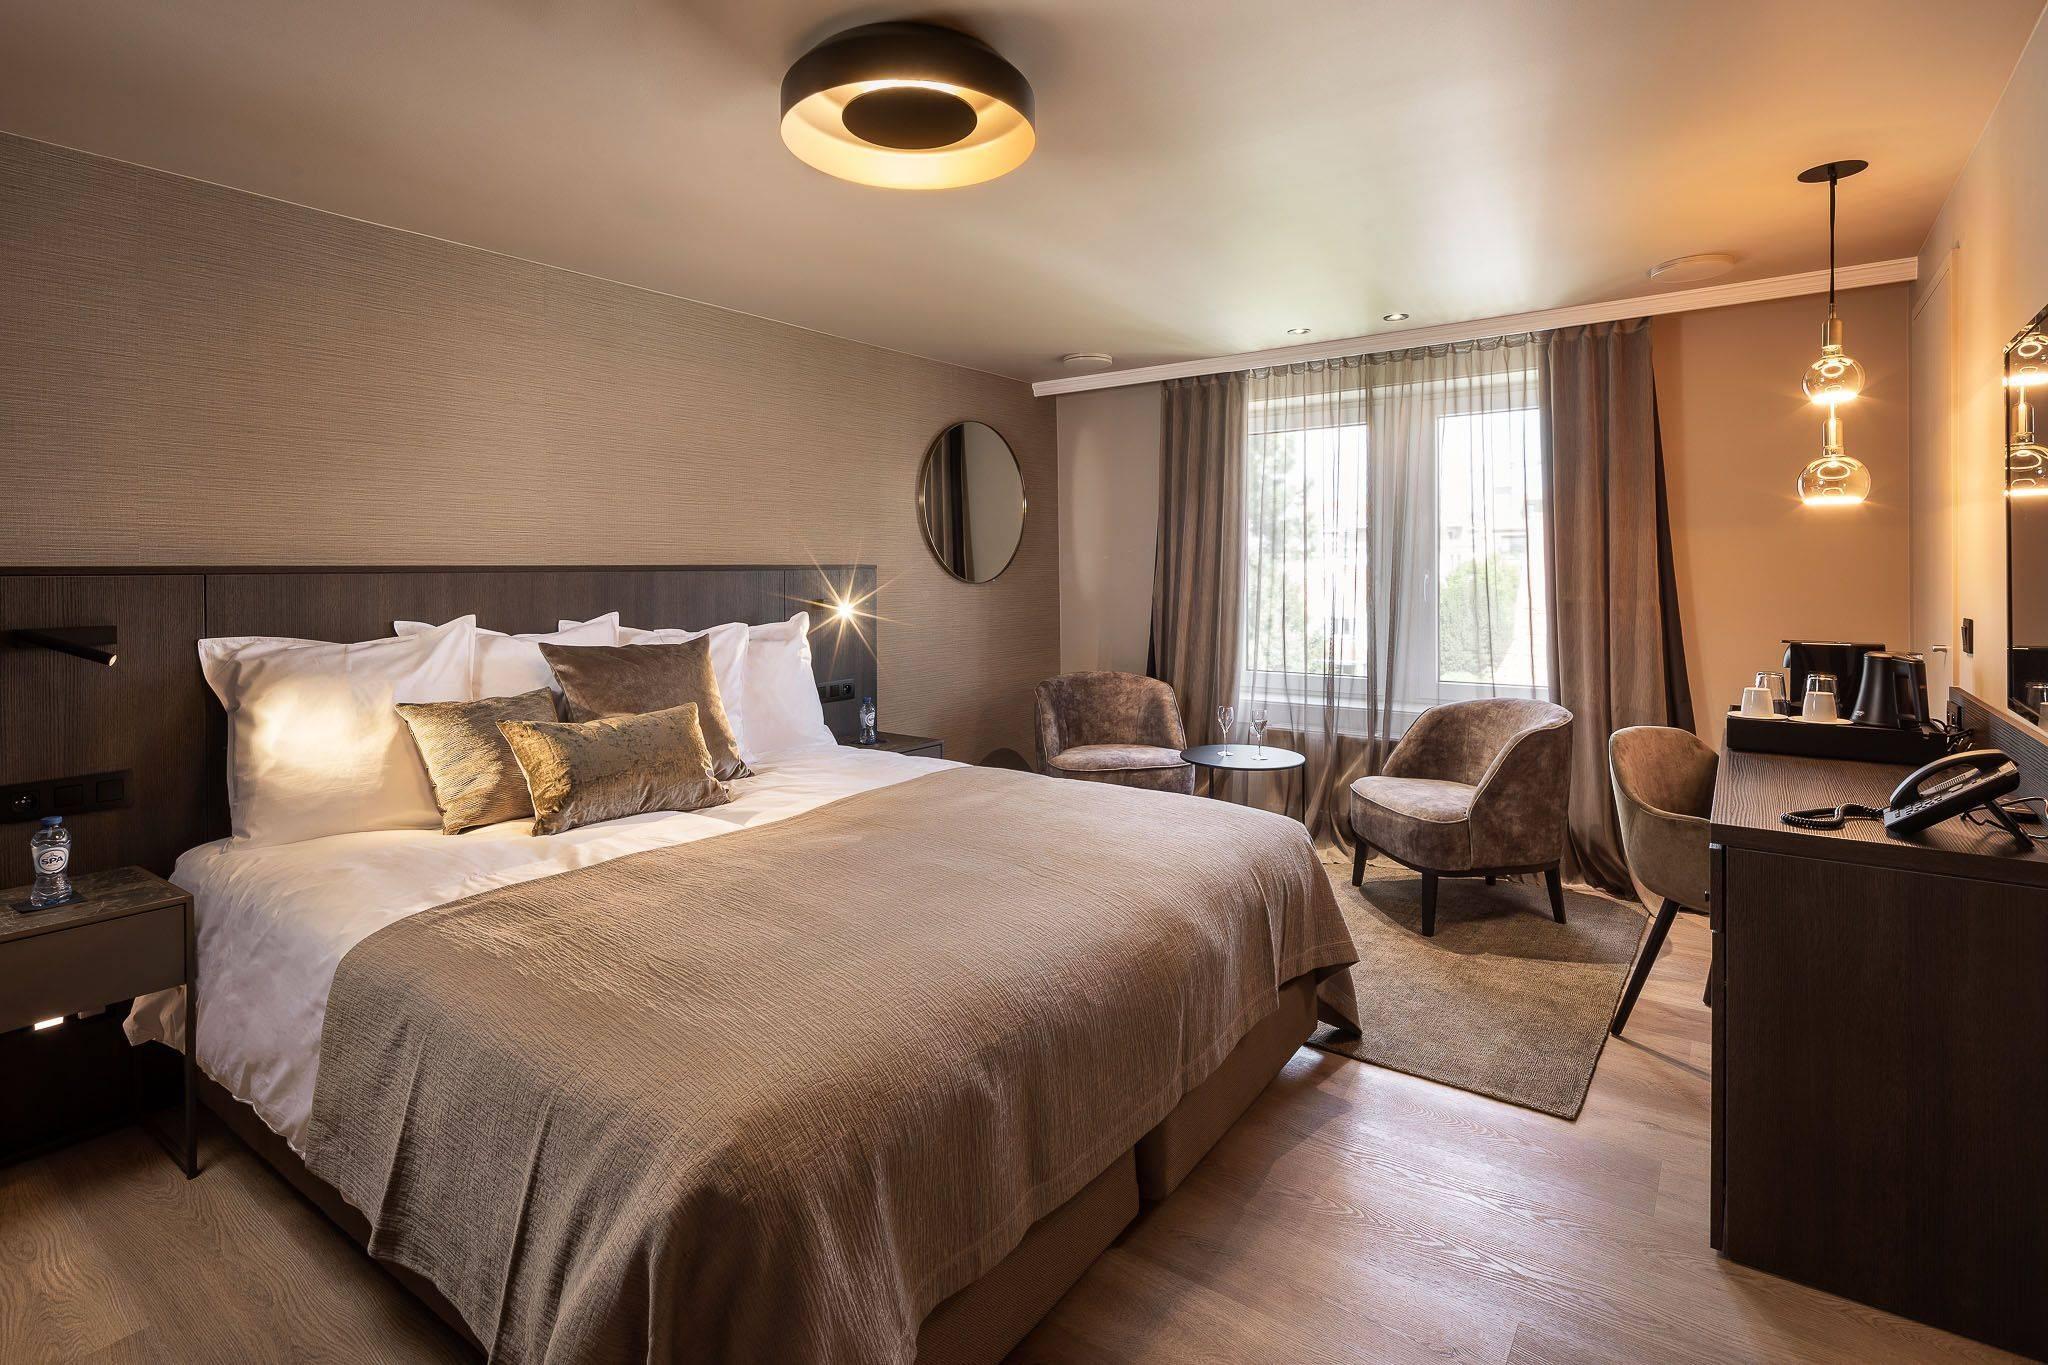 Hotel Lugano STANDARD DOUBLE ROOM